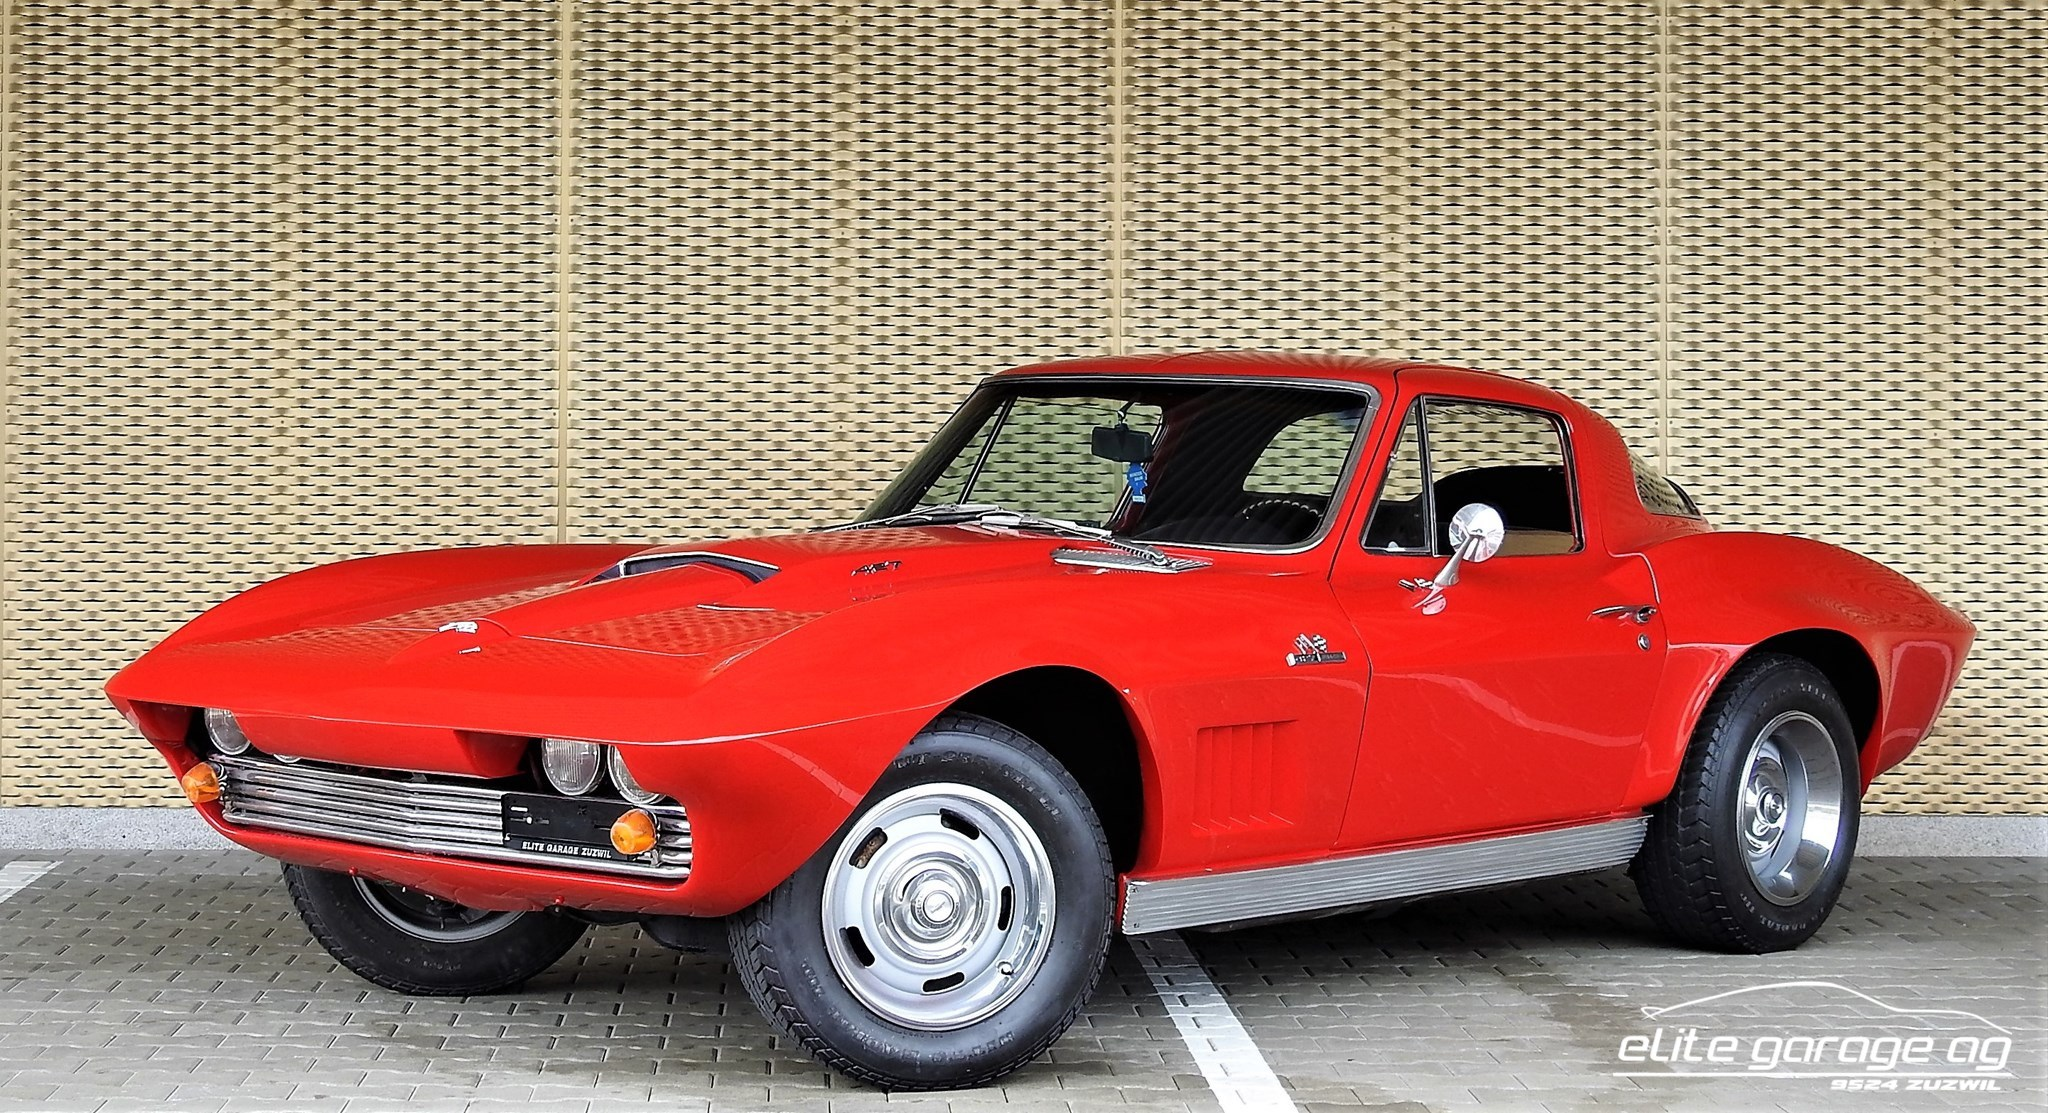 coupe Chevrolet Corvette C2